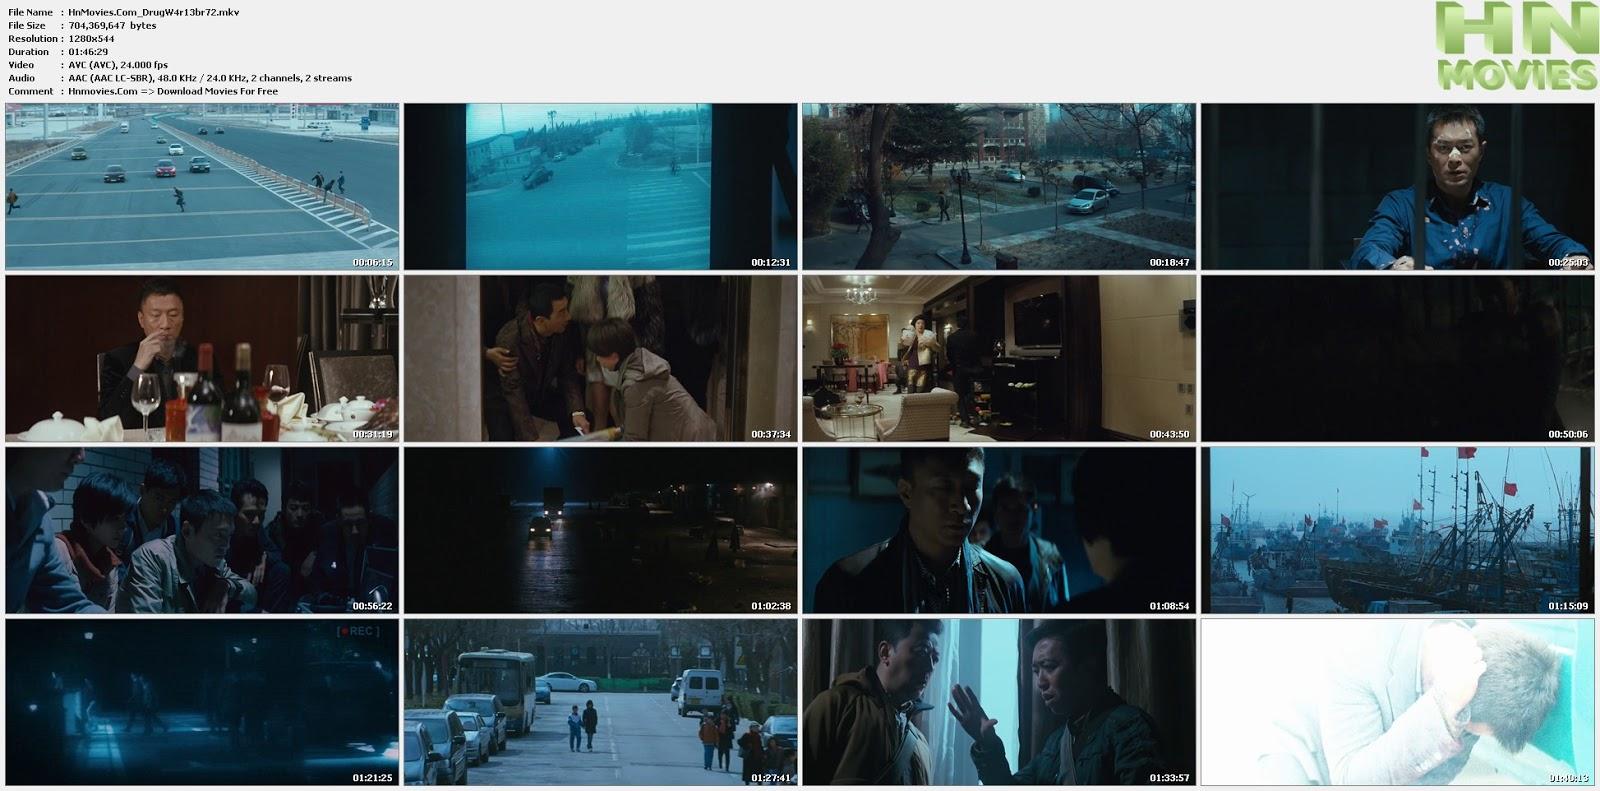 HnMovies.Com DrugW4r13br72.mkv